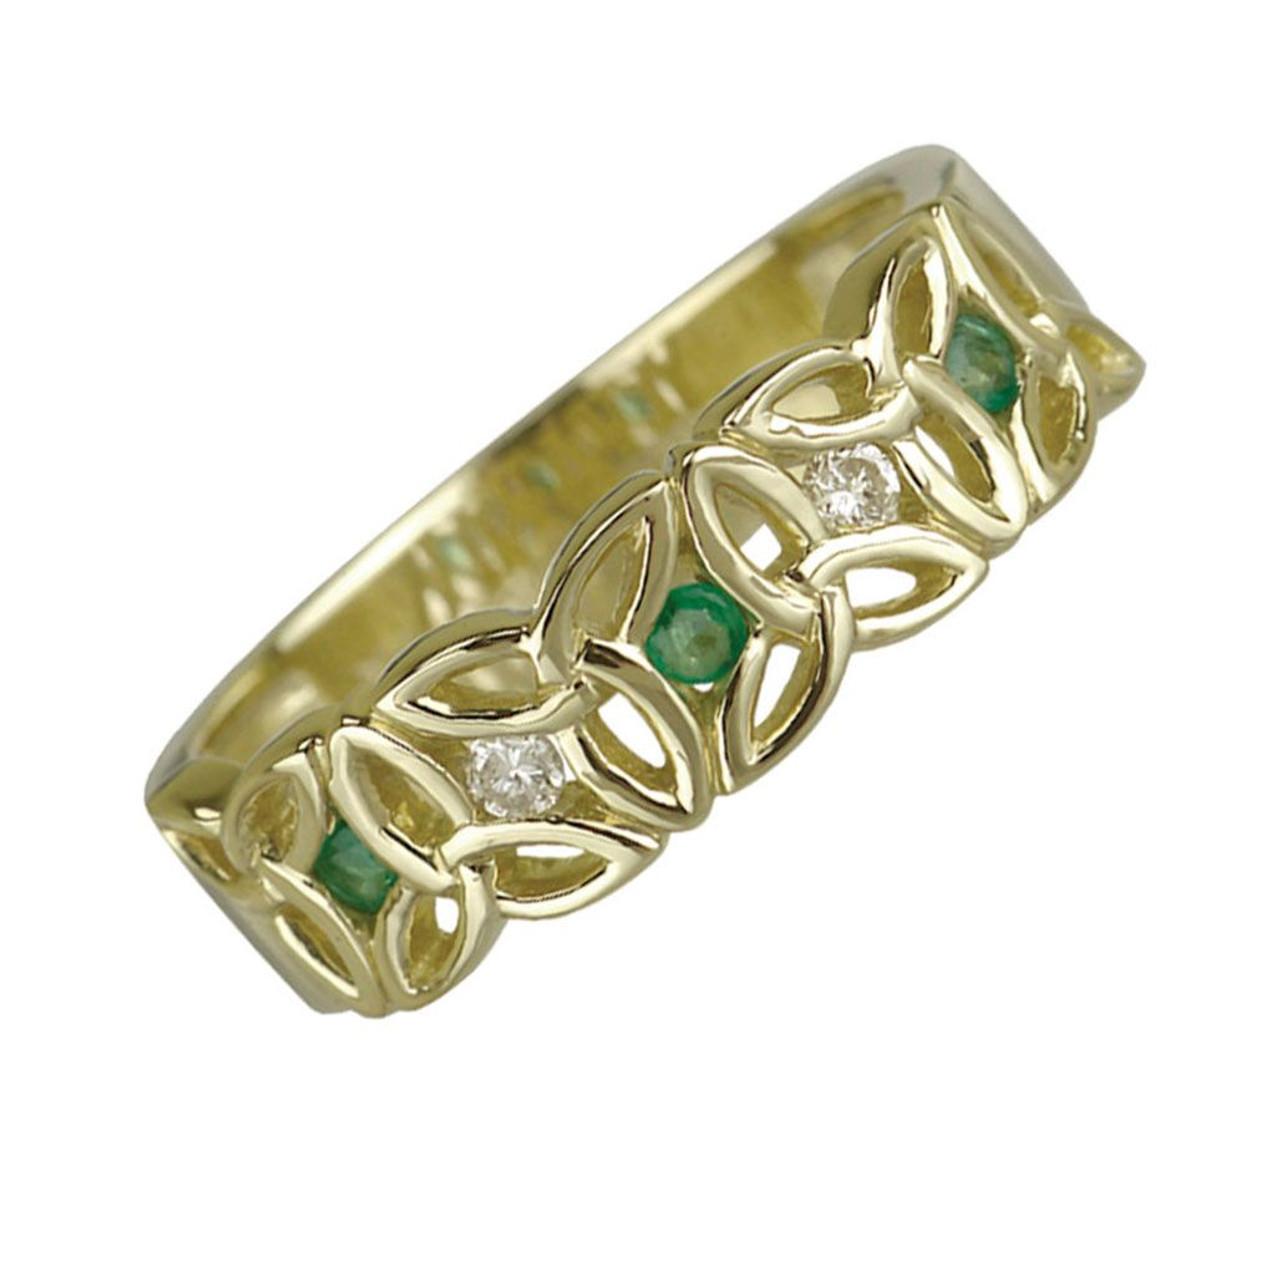 10k Trinity Knot Ring Irish-Made